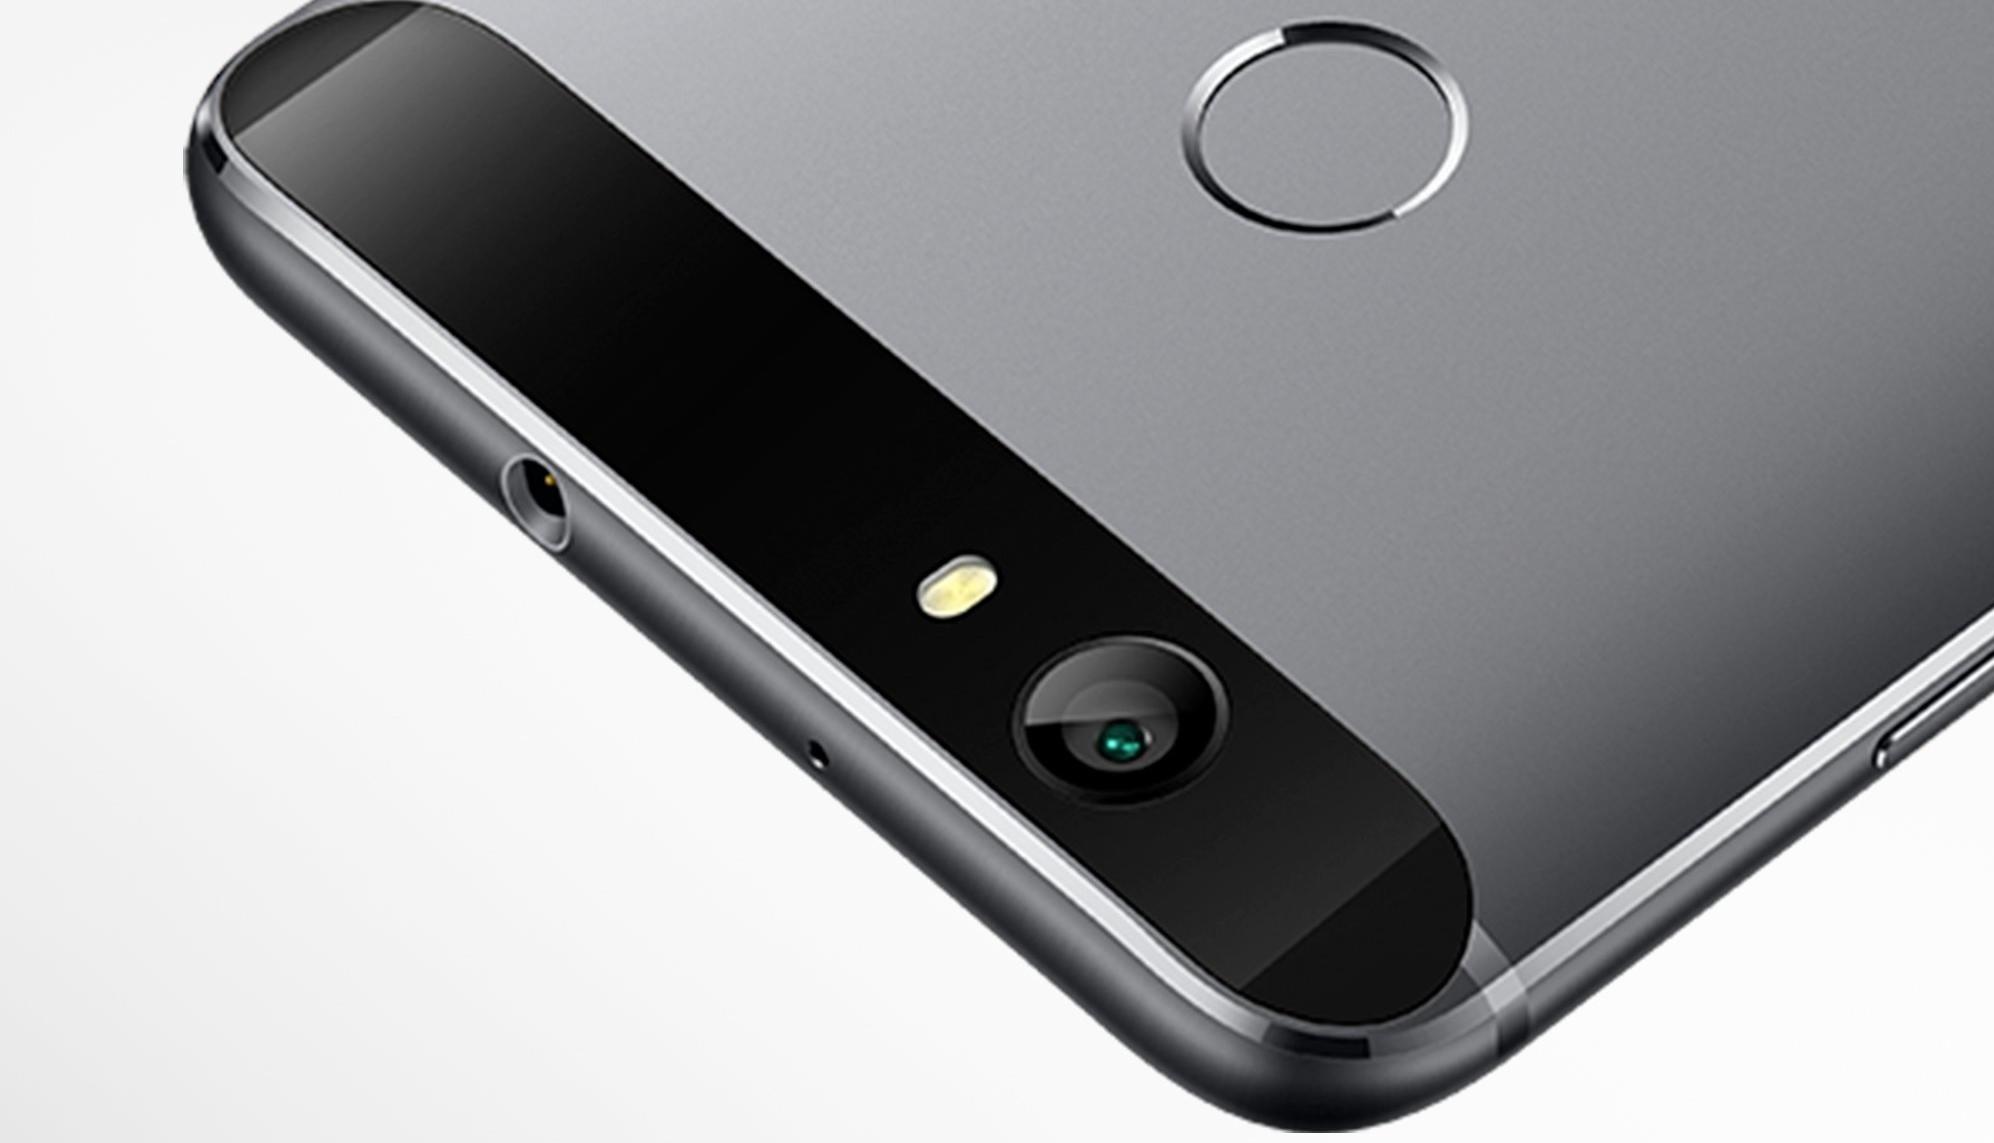 Fingerabdruckscanner als Kameraauslöser